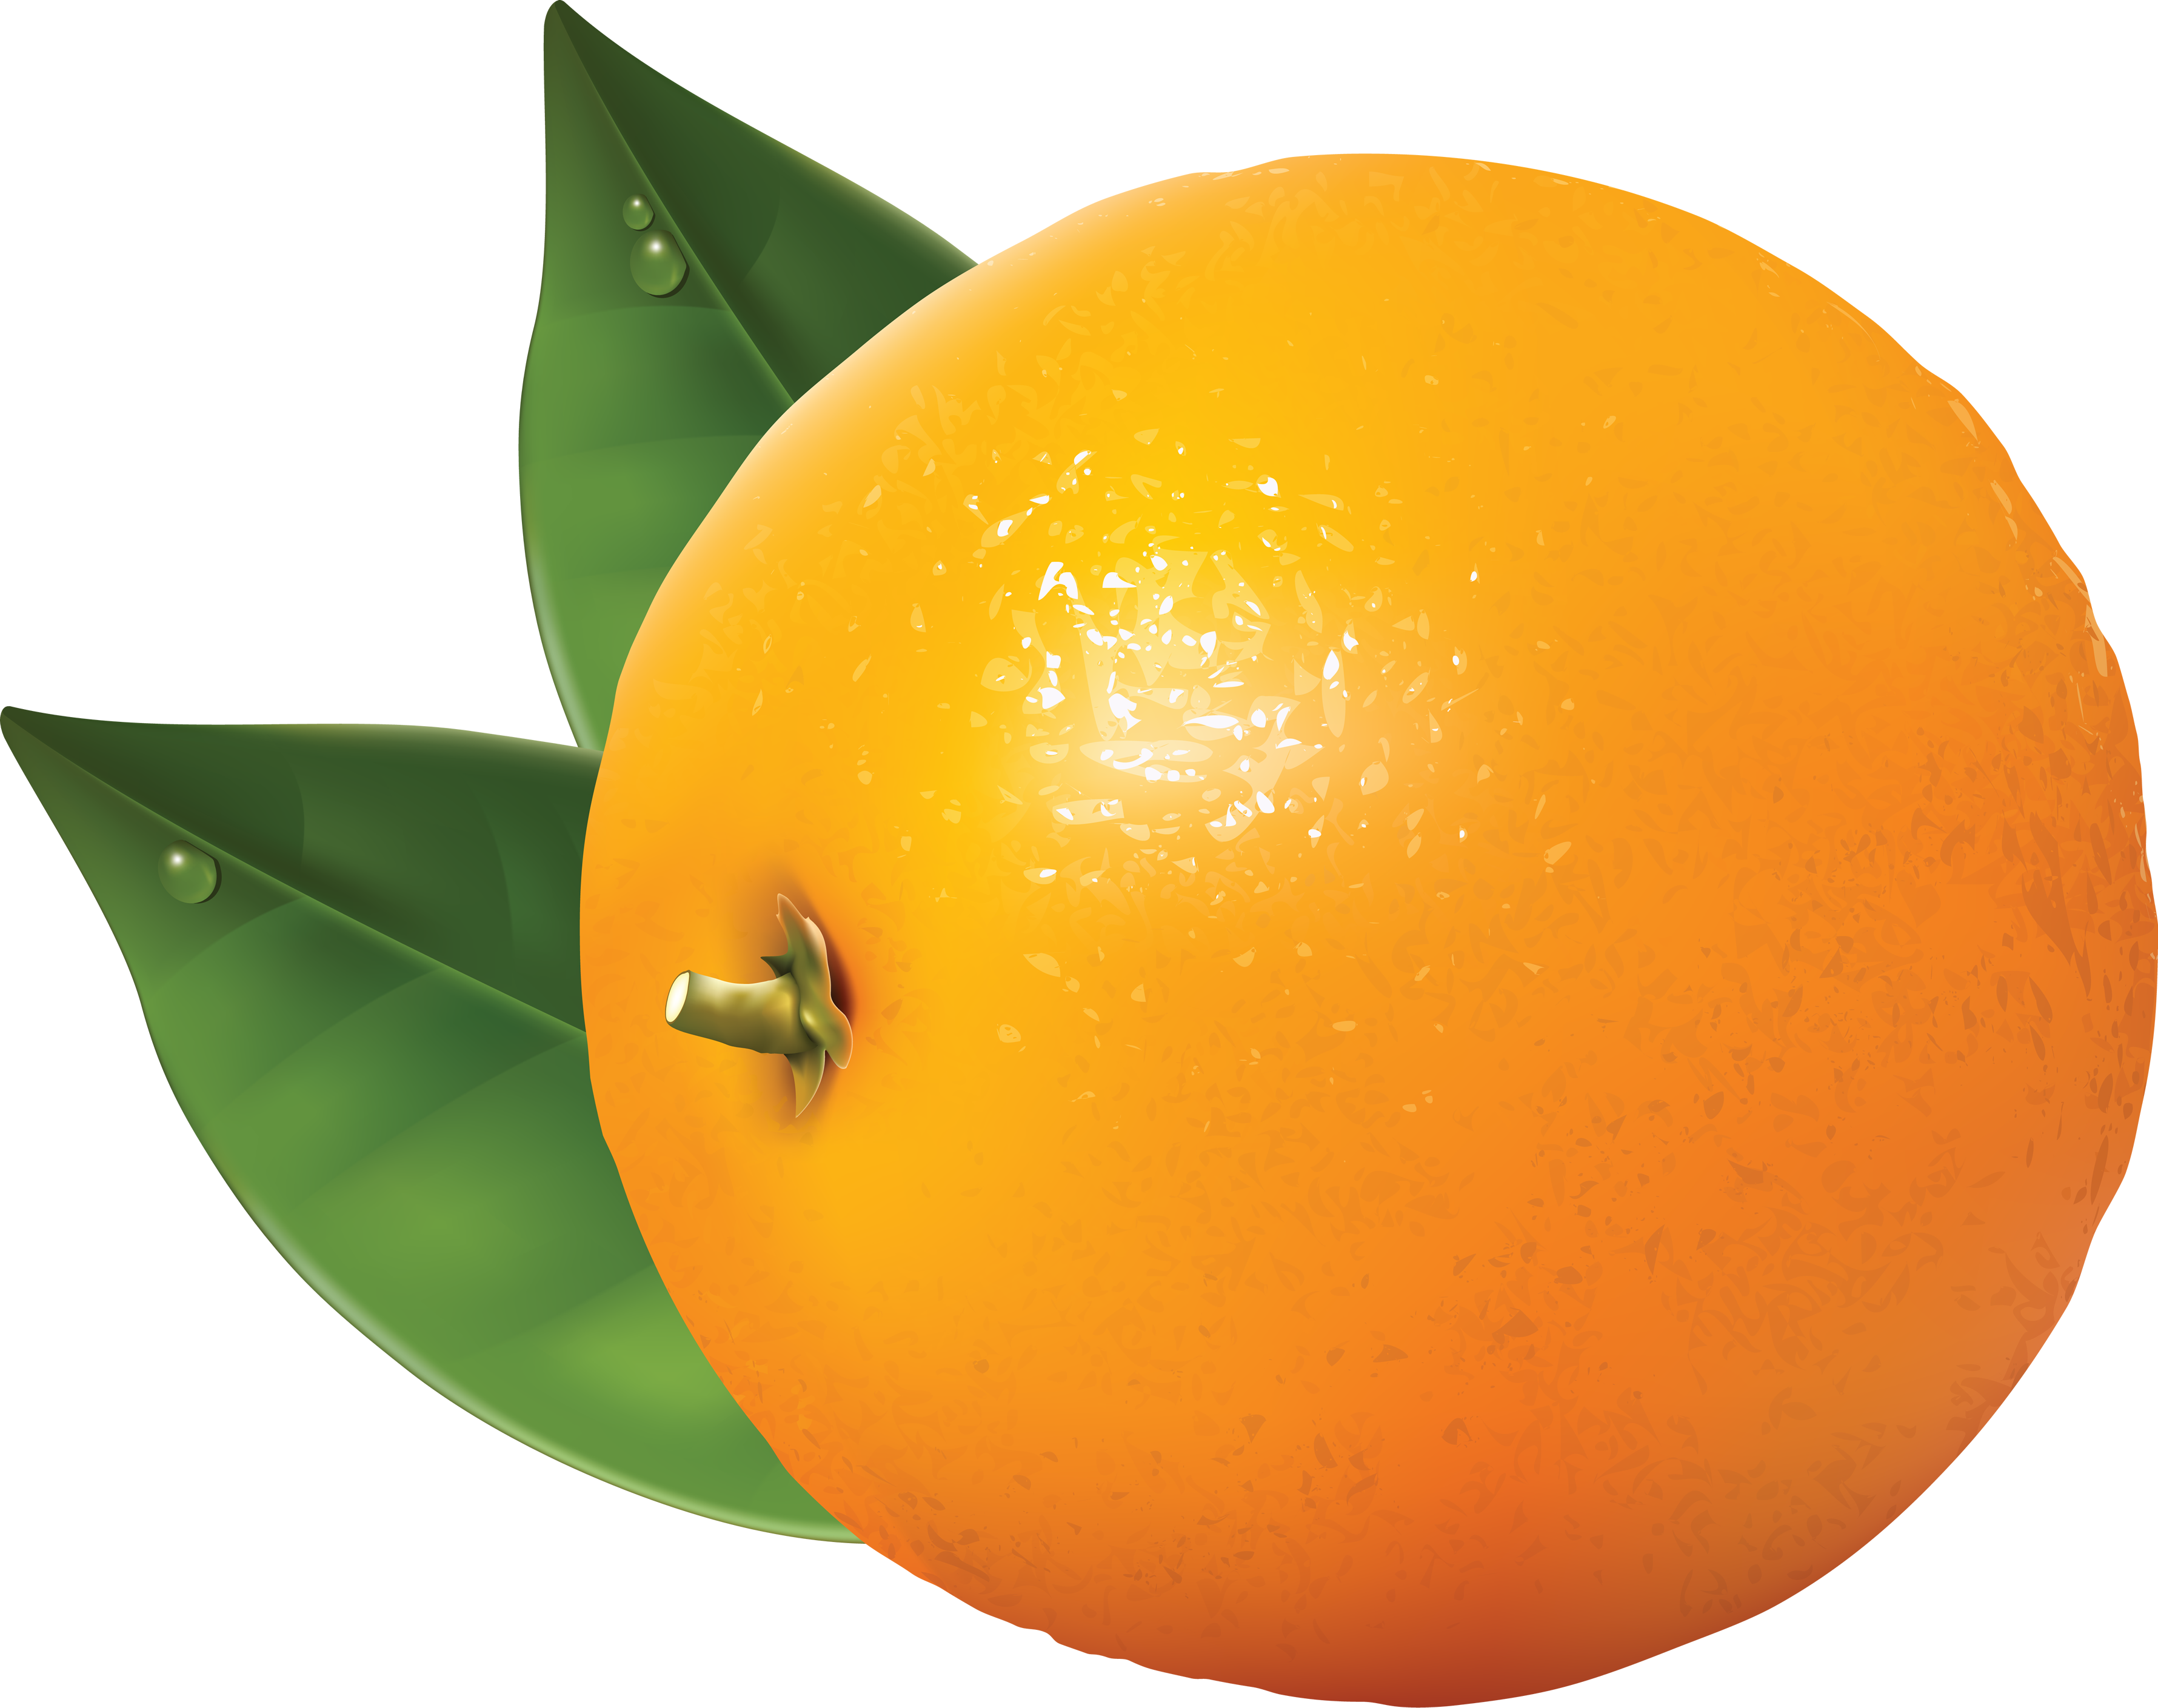 Sunny clipart orange. Twenty four isolated stock